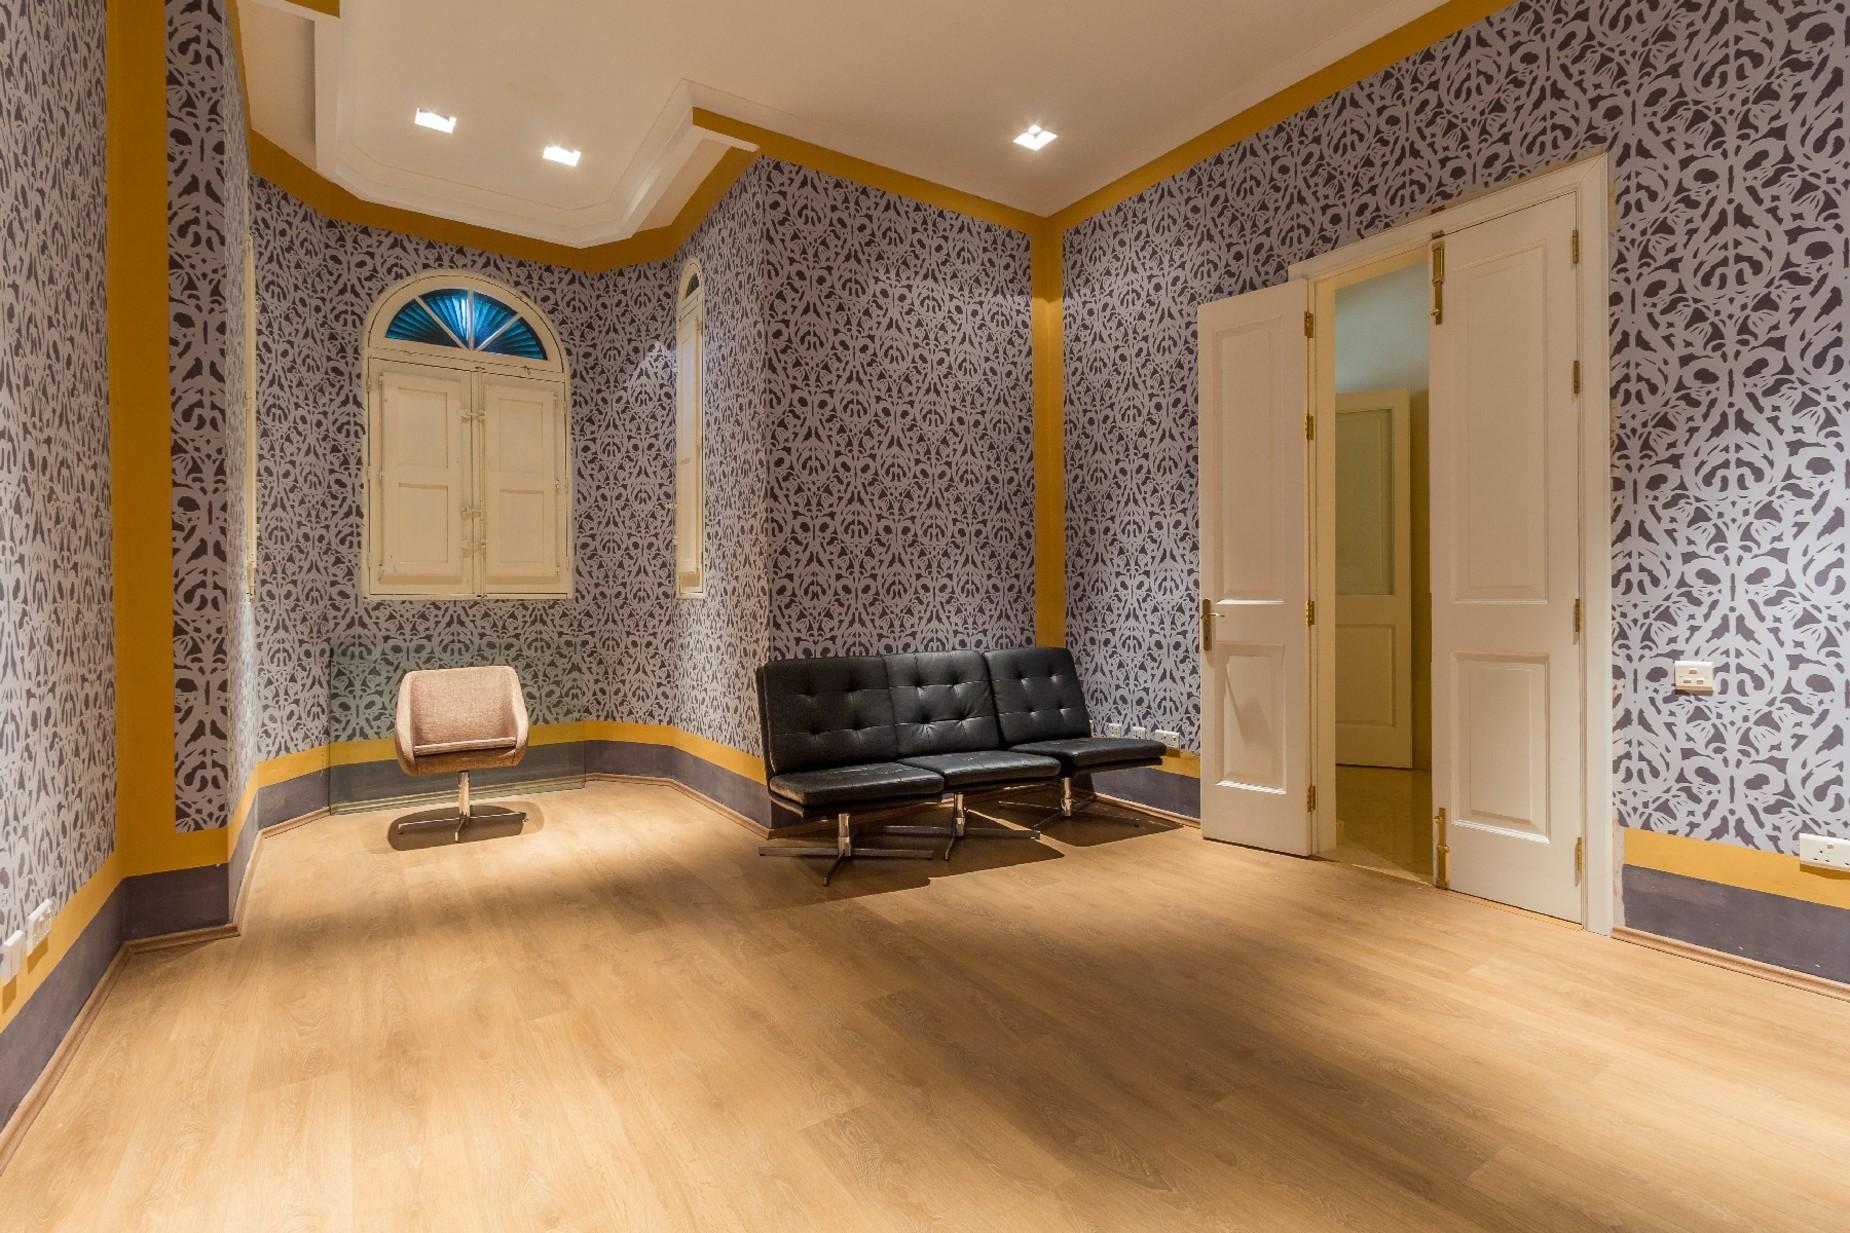 6 bed Palazzo For Rent in Balzan, Balzan - thumb 7